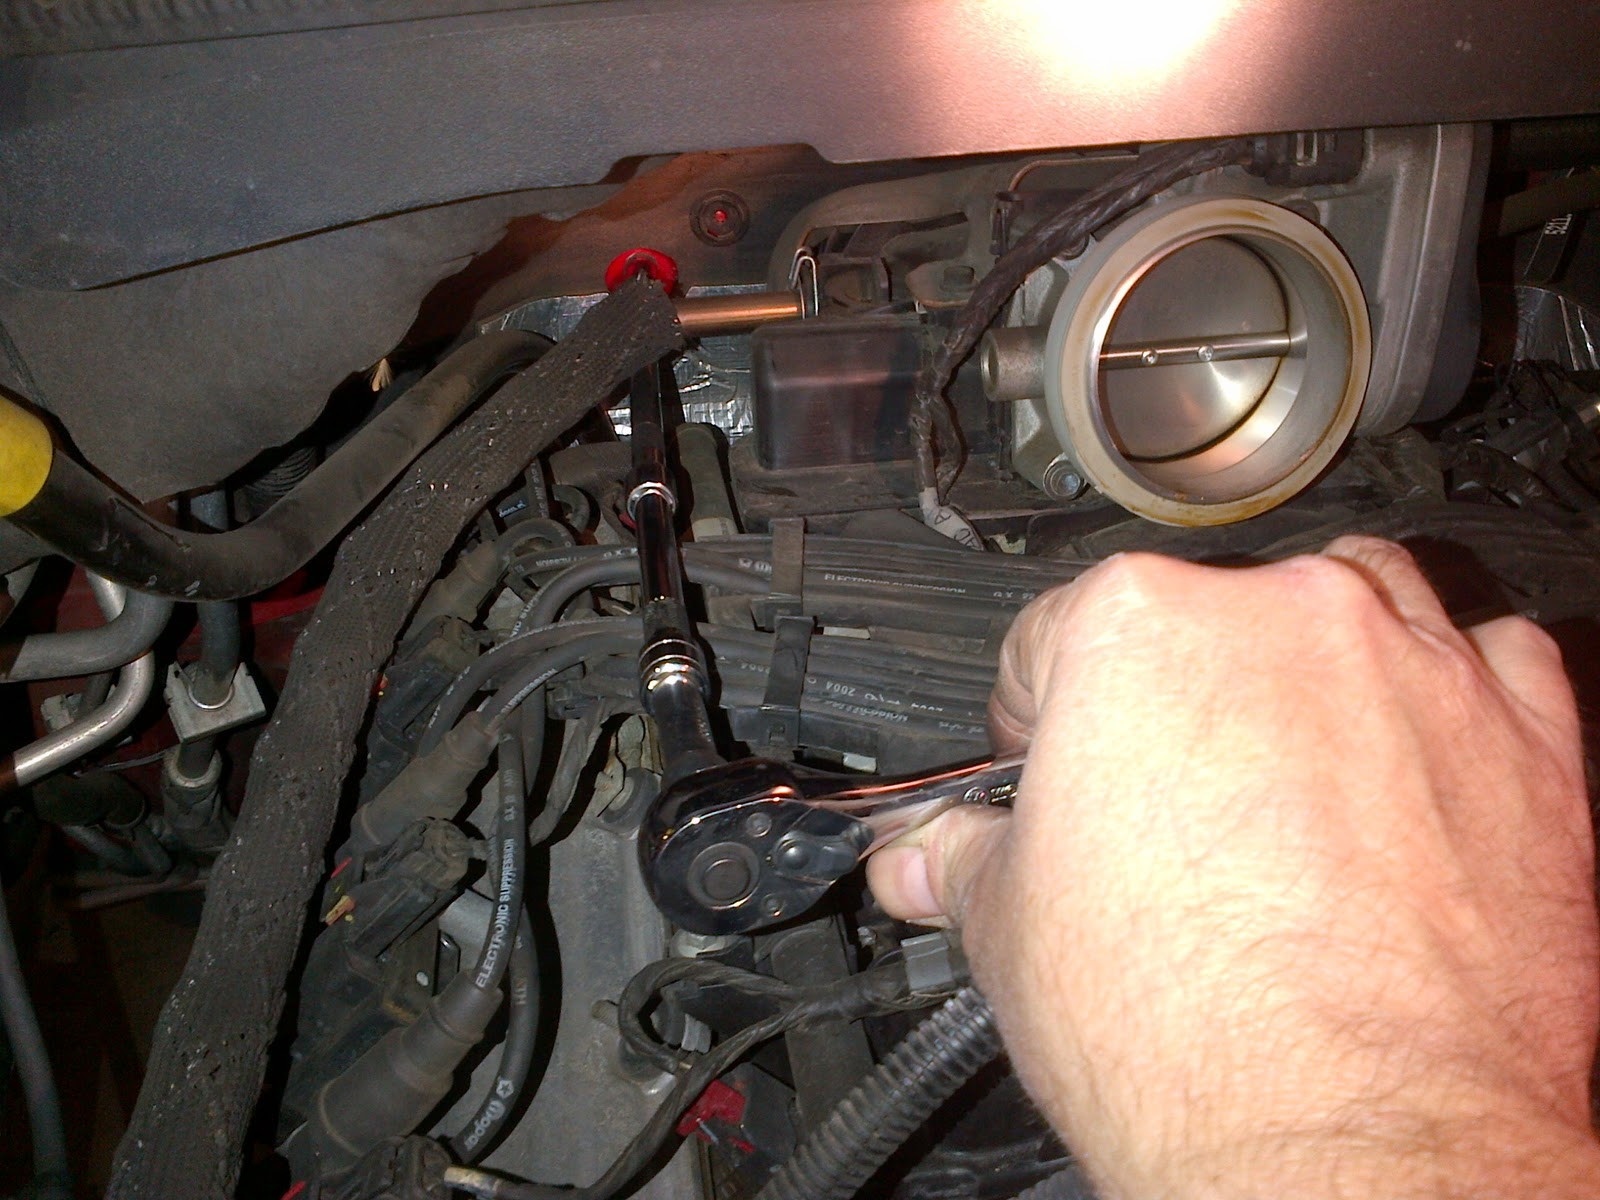 rf mazda engine service manual free download